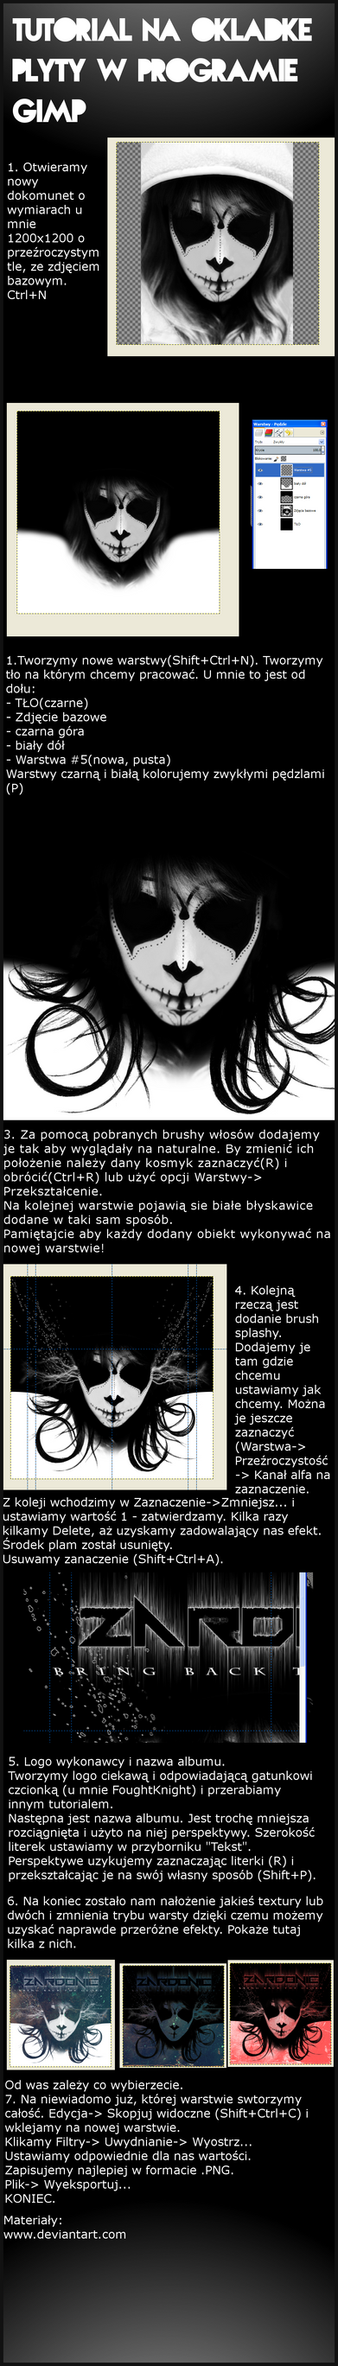 CD Cover Tutorial PL GIMP by Darin69